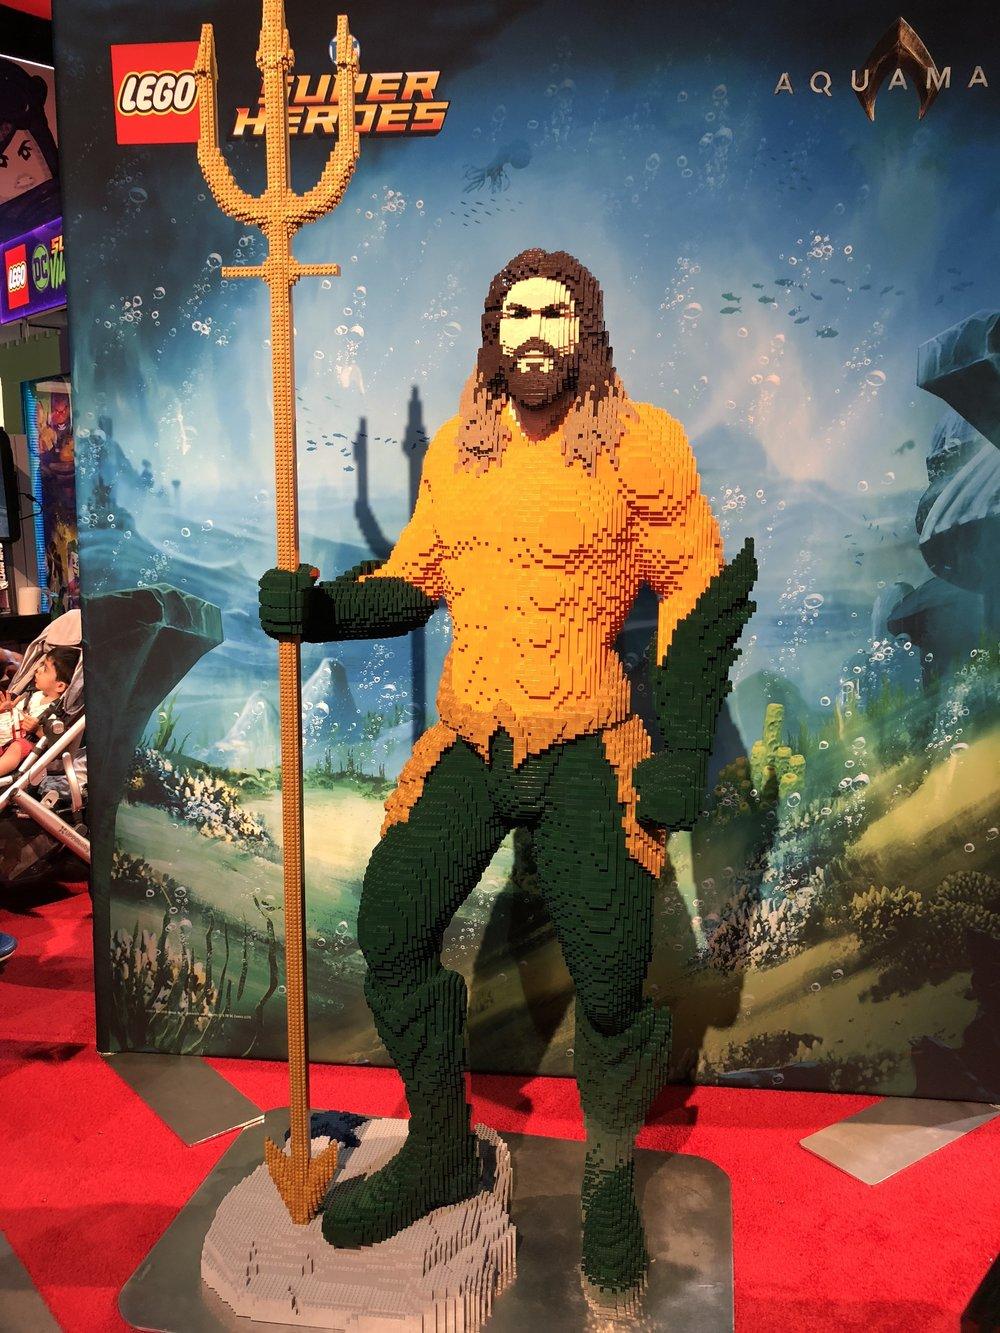 Aquaman Lego